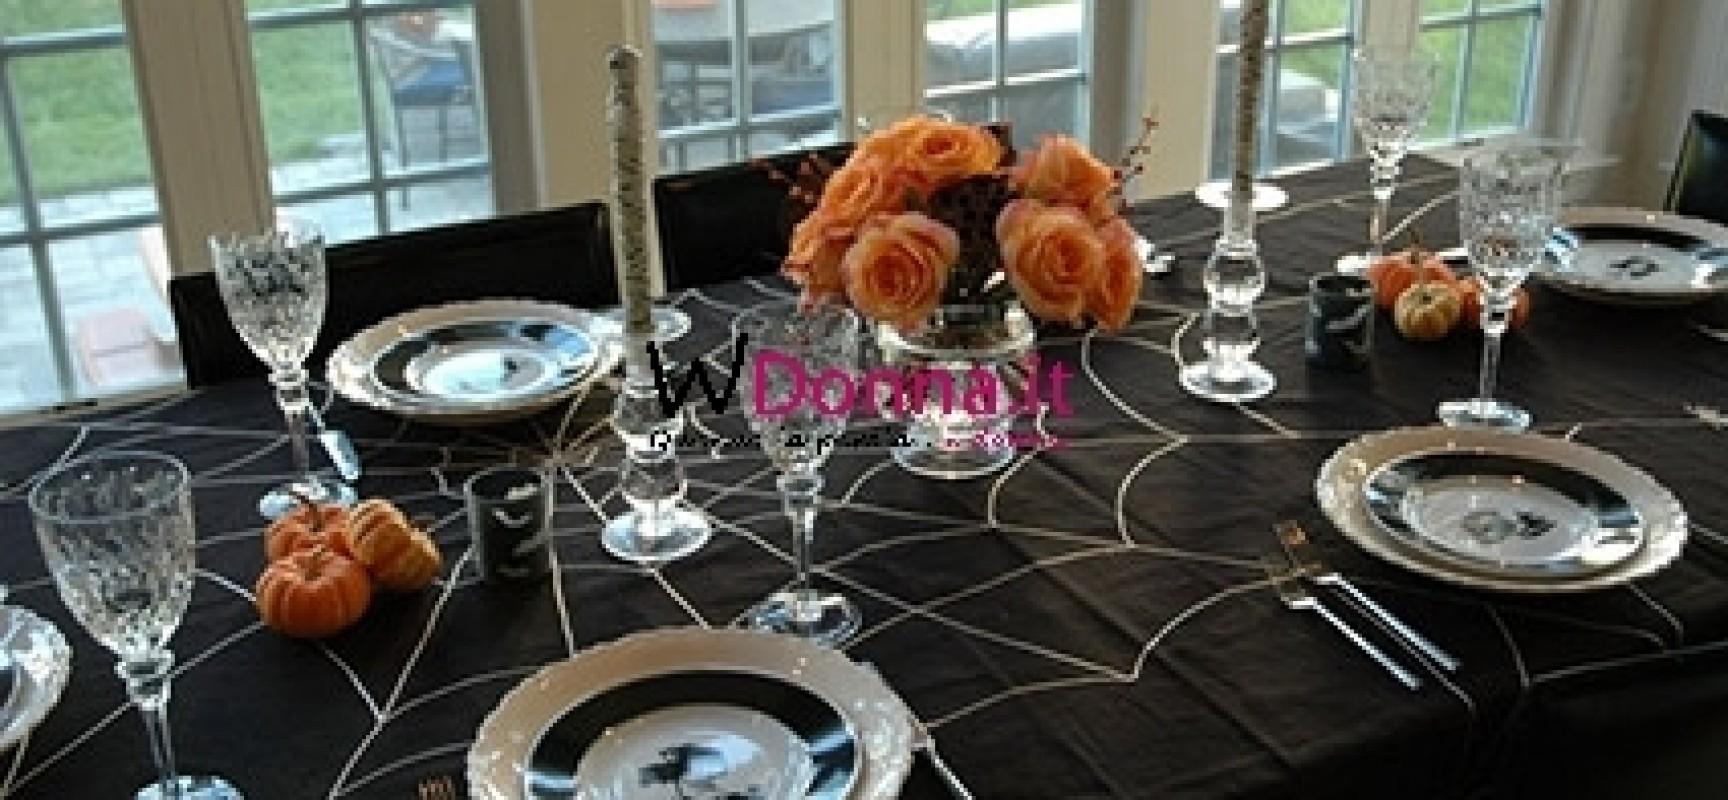 Halloween decorazioni per la tavola - Decorazioni tavola halloween ...